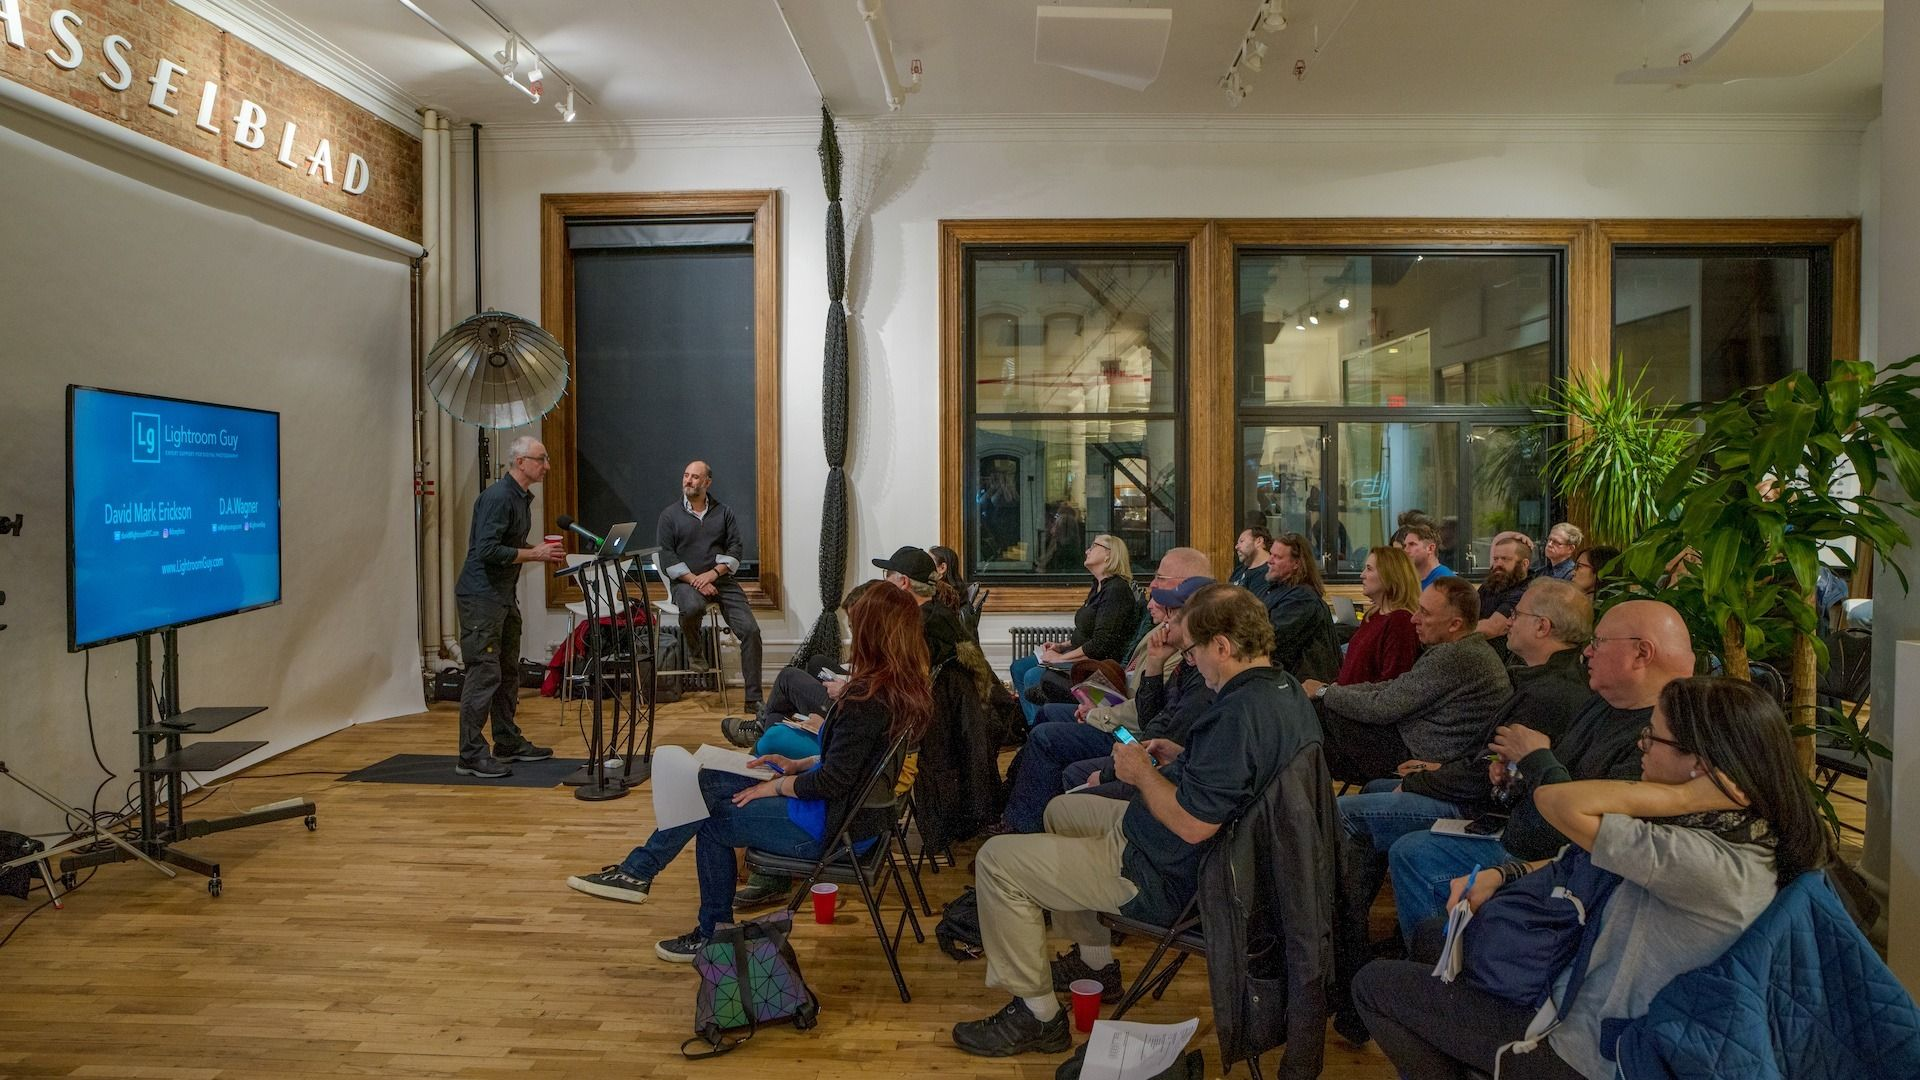 NYC Lightroom Meetup Group